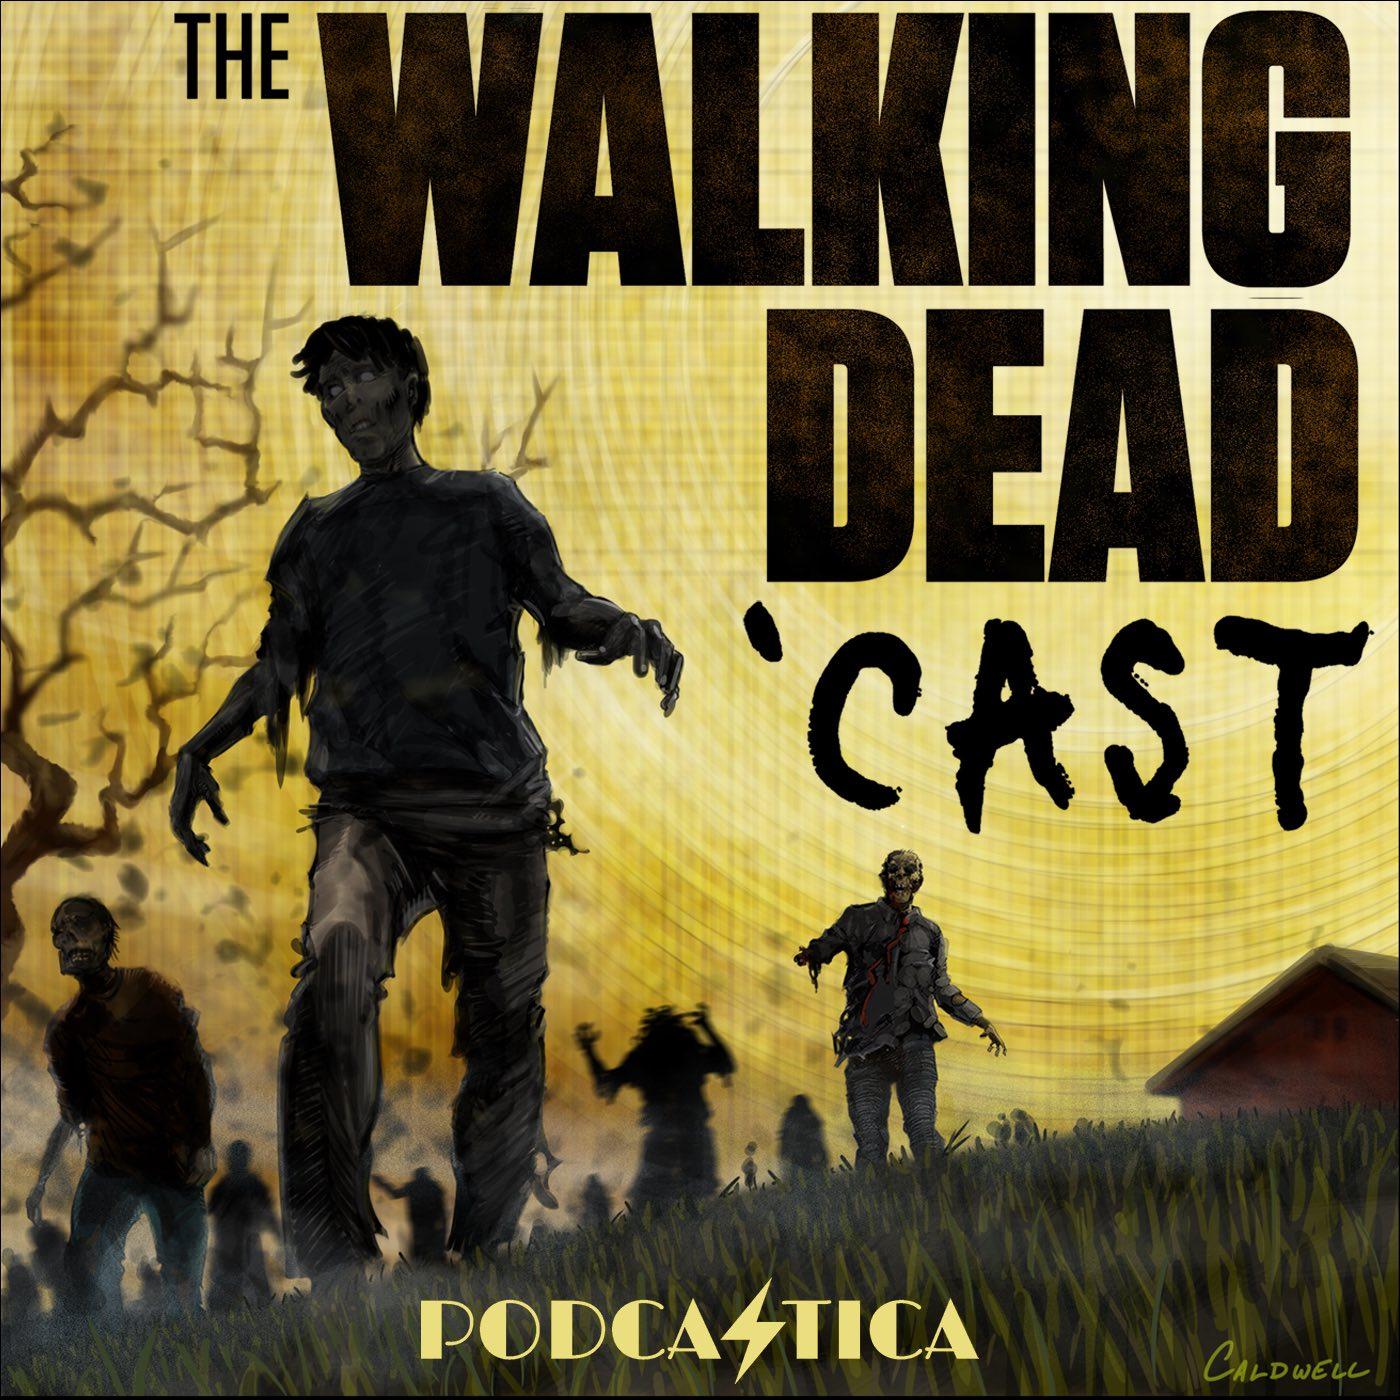 WDC podcast art (podcastica new).jpg